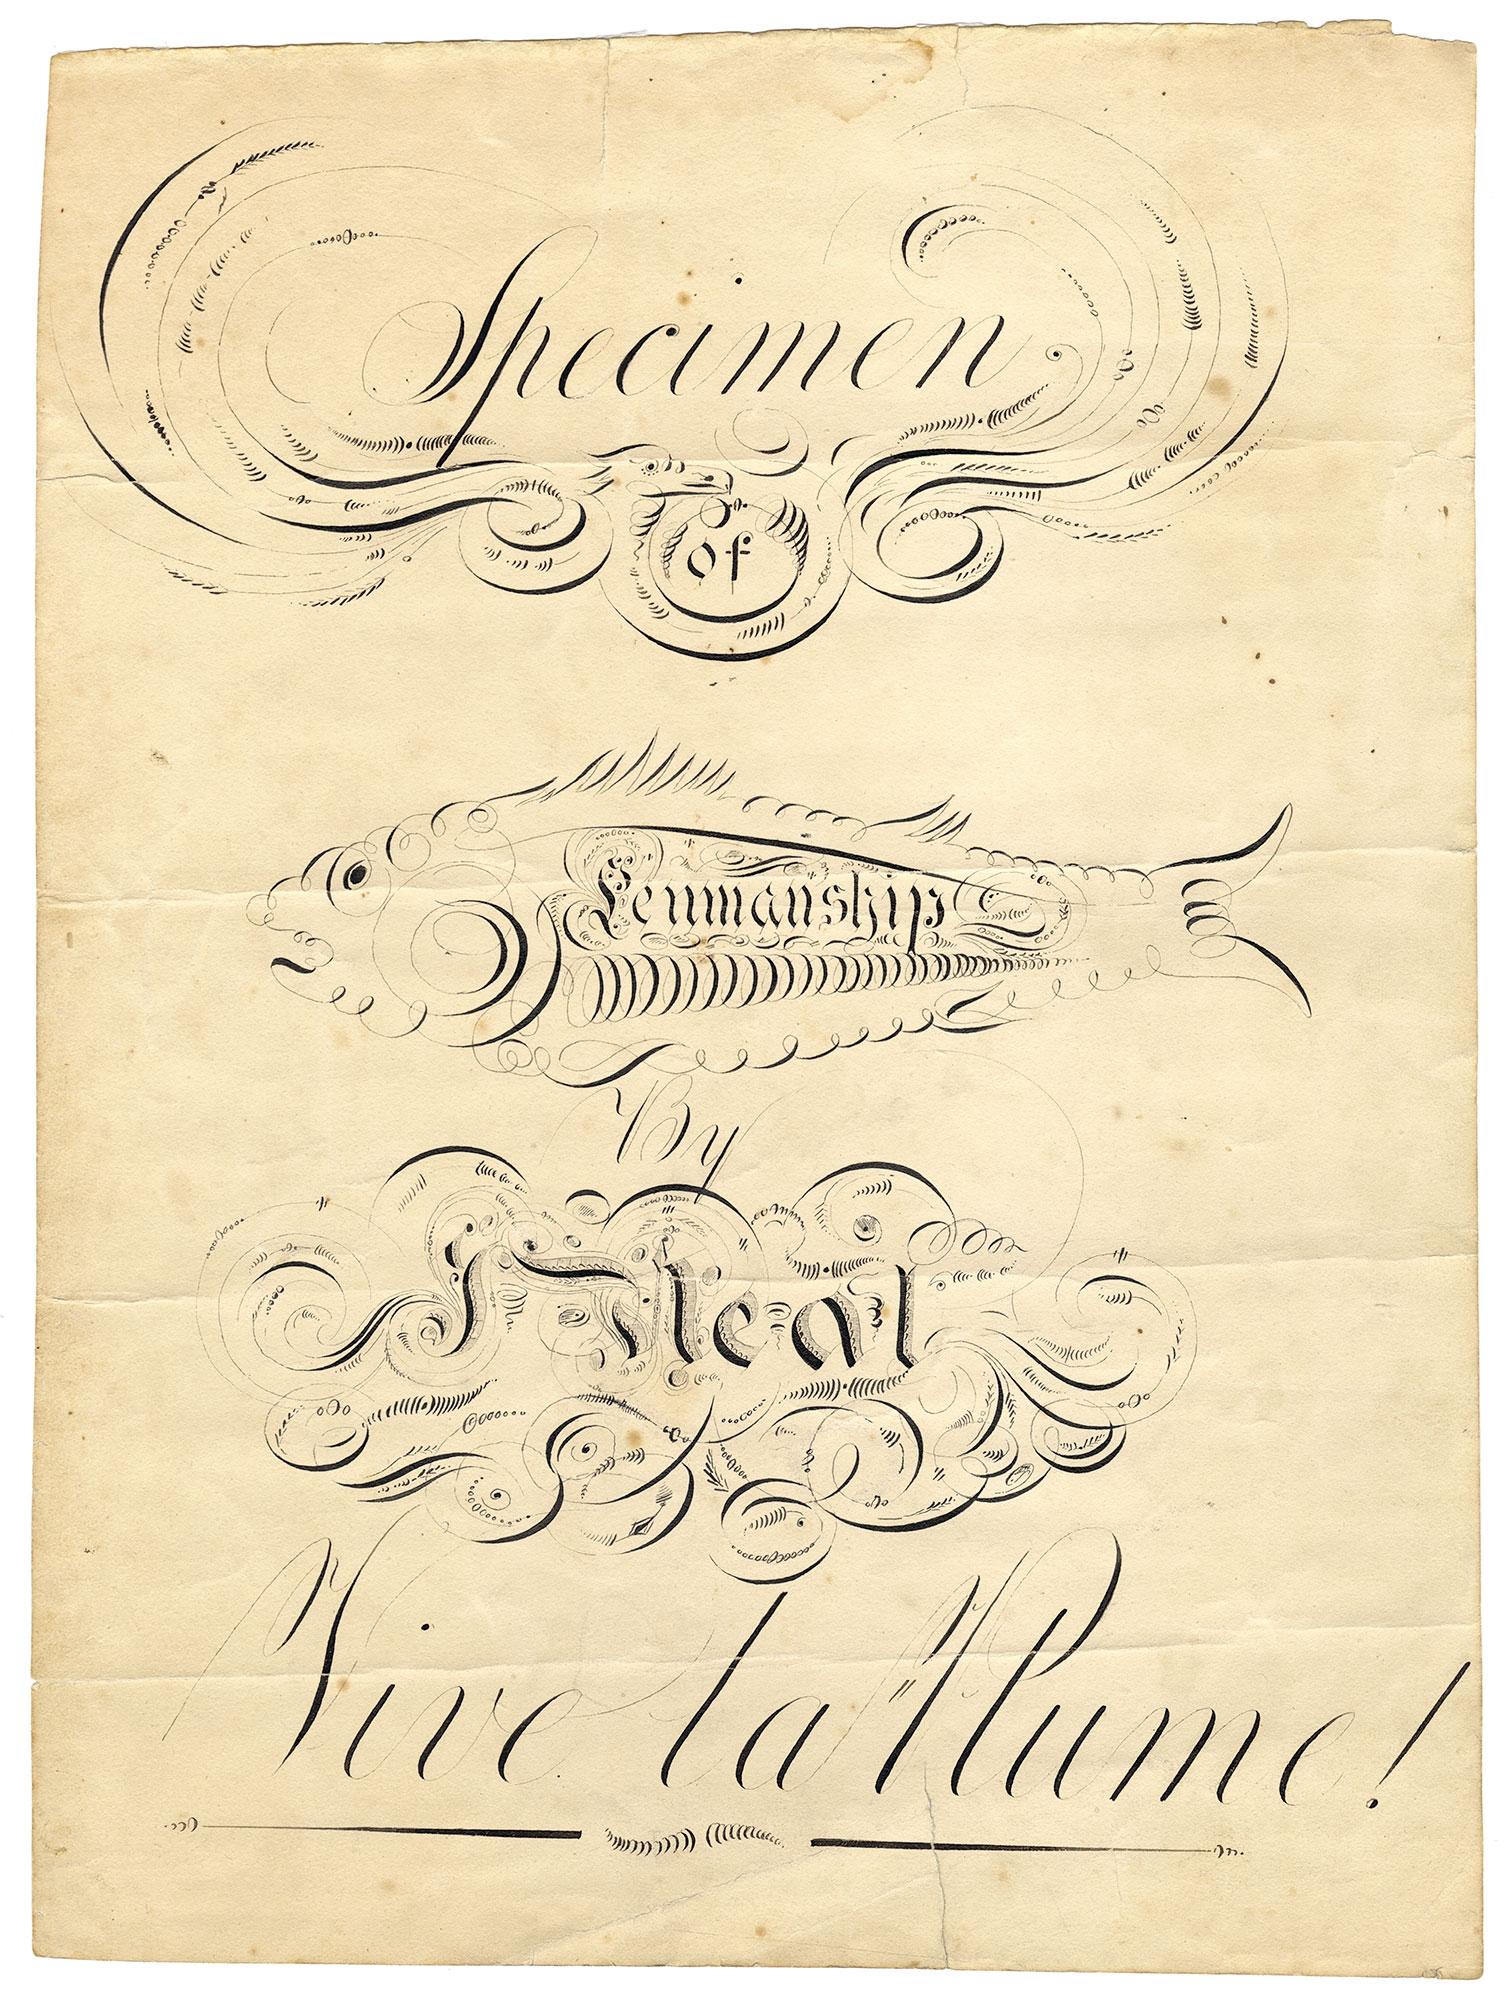 John Neal, Specimen / of / Penmanship / by / J. Neal / Vive La Plume!, ca. 1813